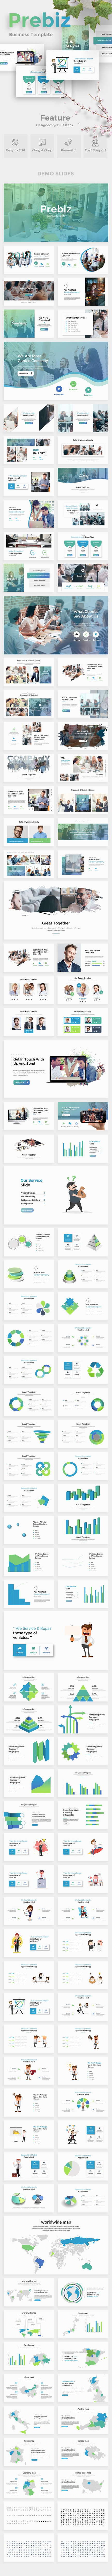 Prebiz Business Google Slide Template - Google Slides Presentation Templates